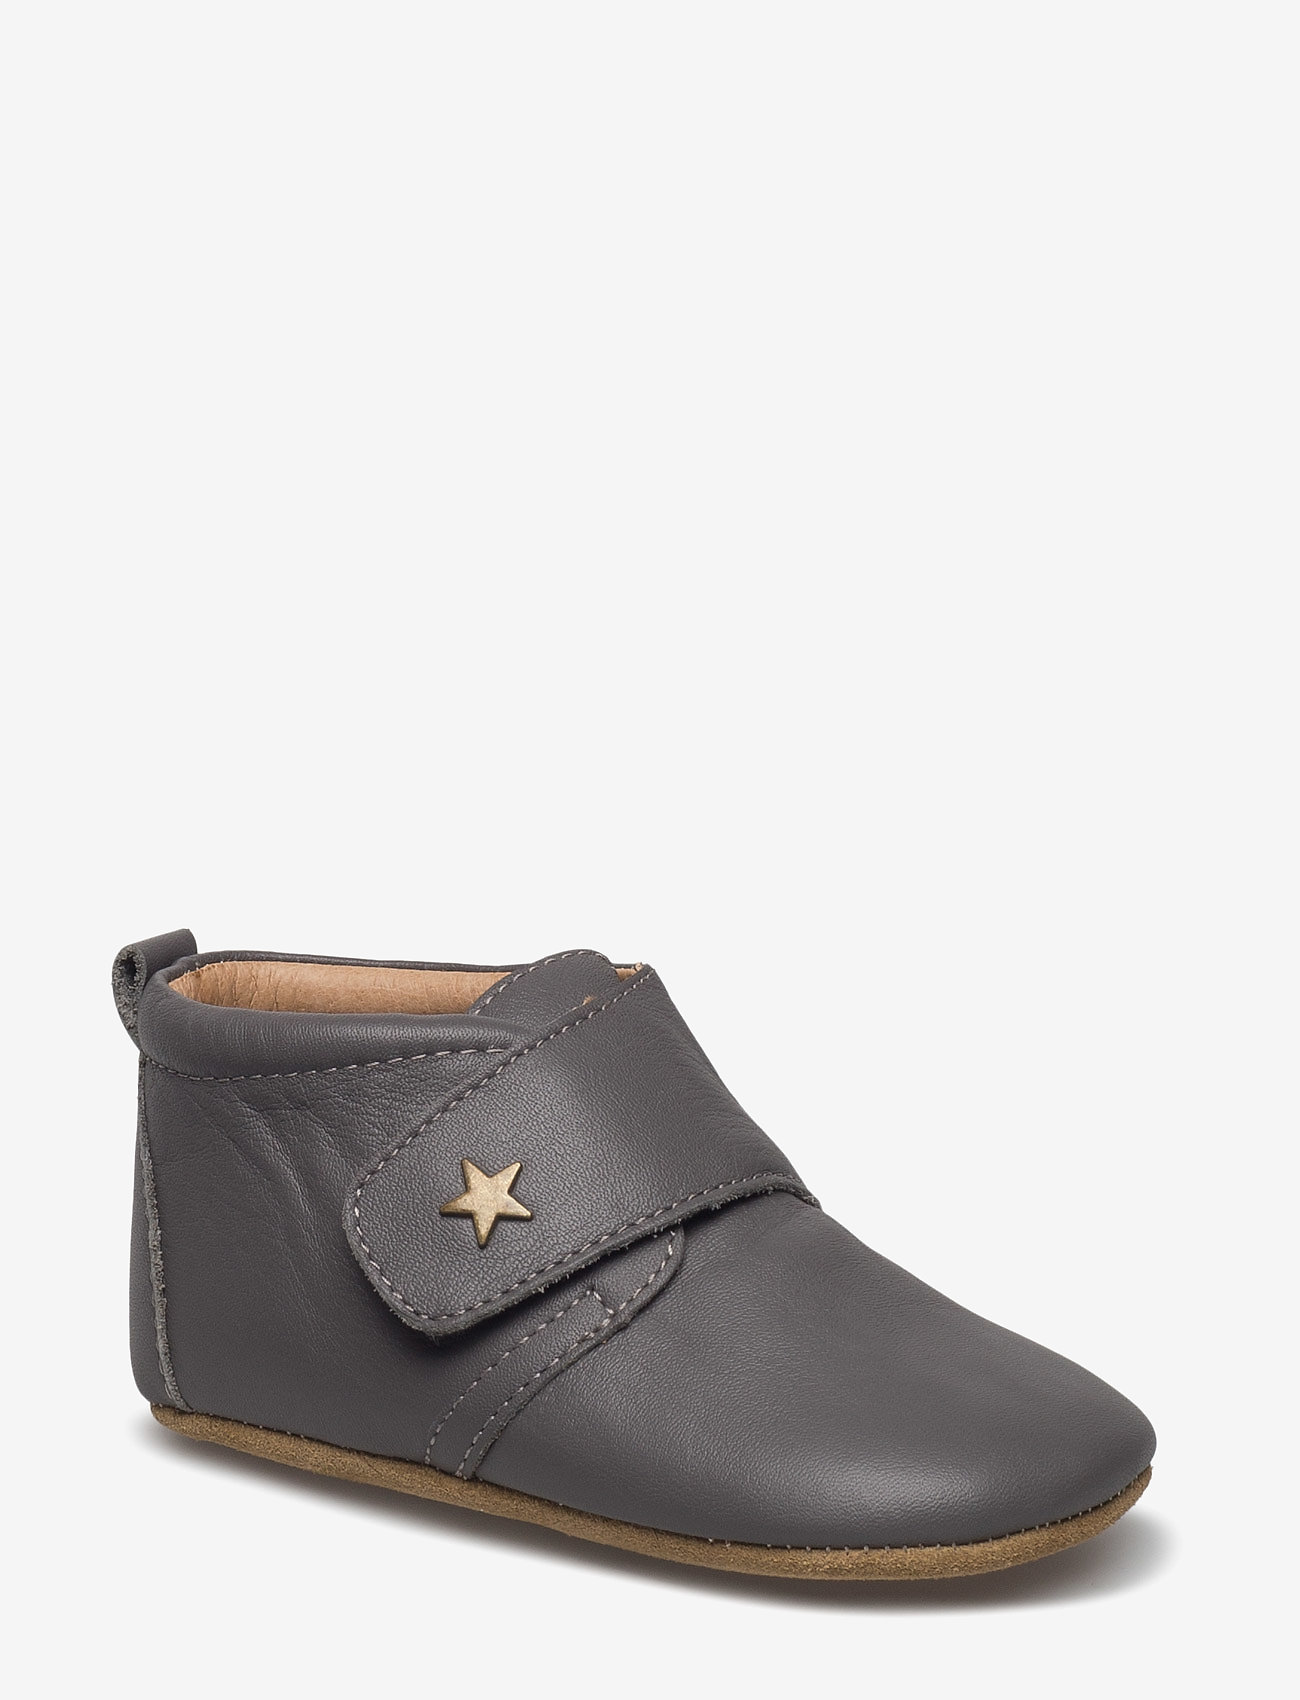 Bisgaard - HJEMMESKO - velcro stjerne - pantoufles - grey - 0